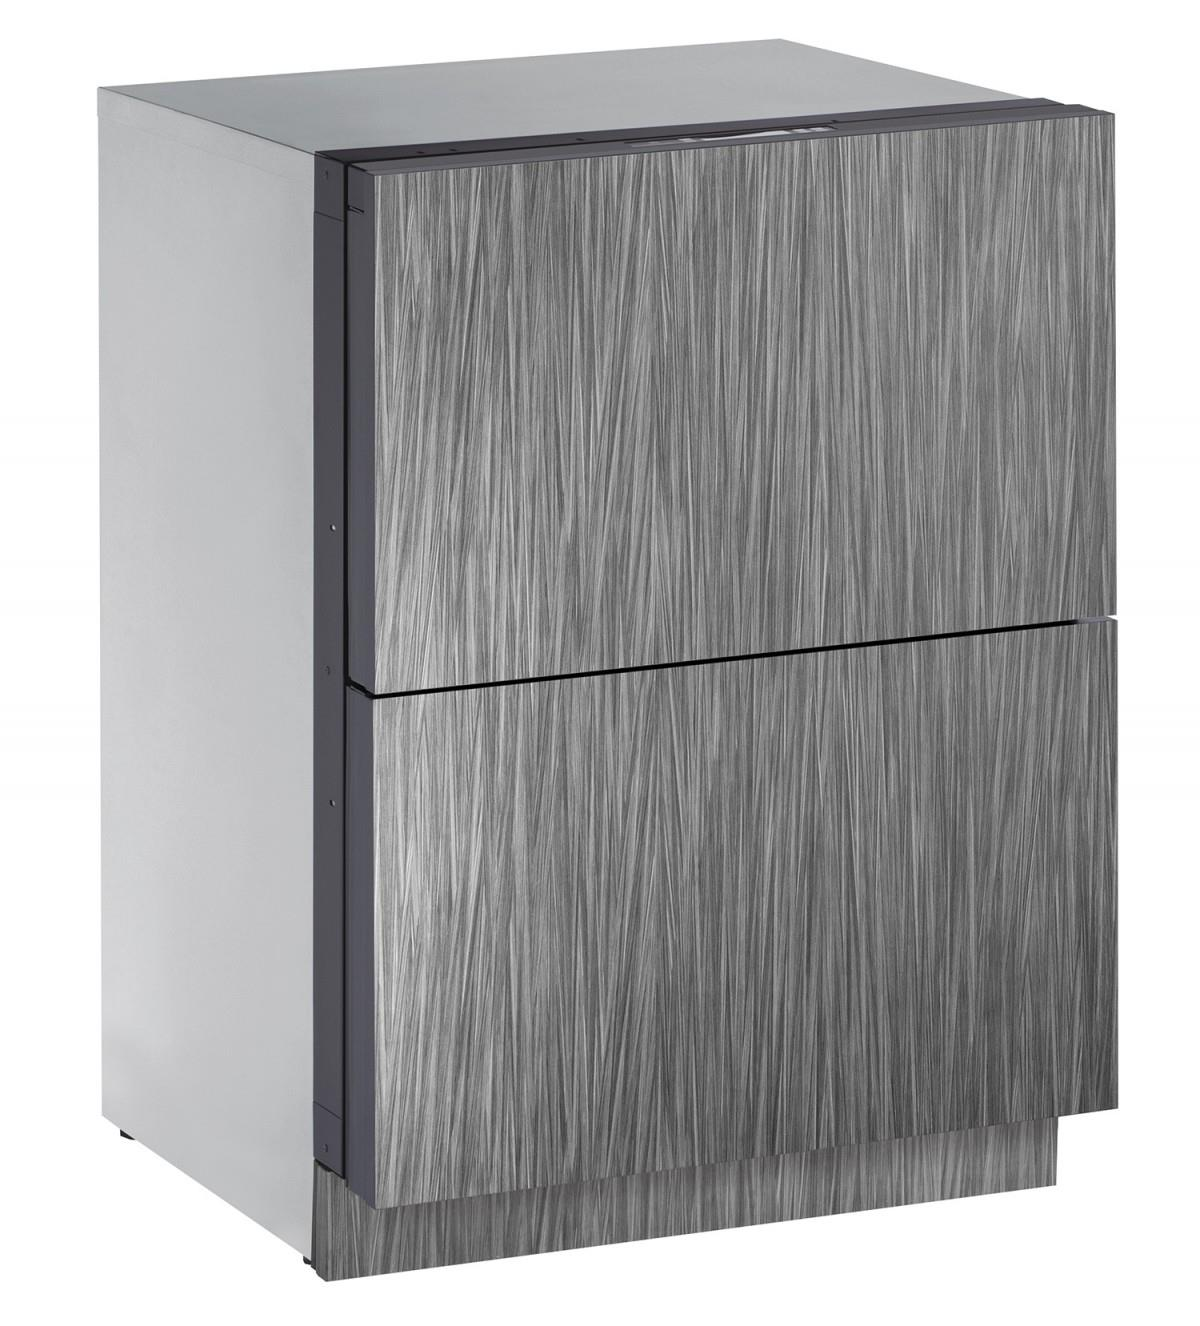 U-Line Refrigerators 4.5 cu. ft. Built-in Two Drawer Refrigerator - Item Number: U-3024DWRINT-00A